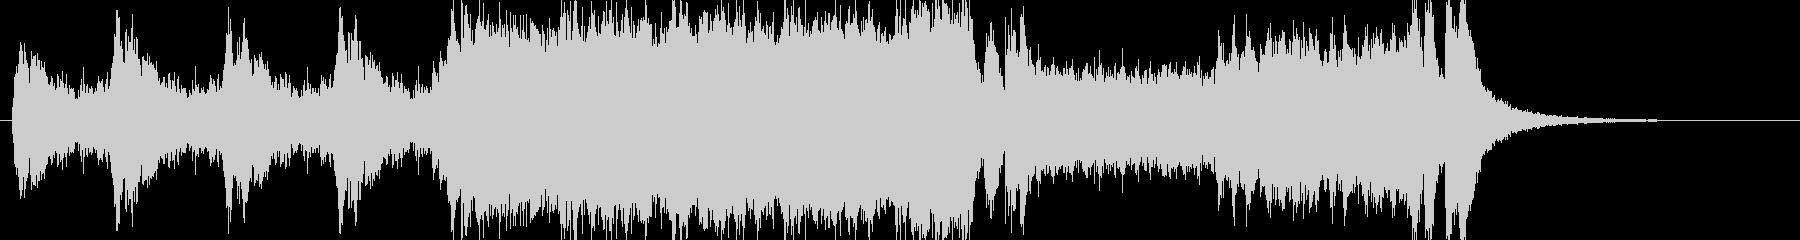 Opening Orchestraの未再生の波形